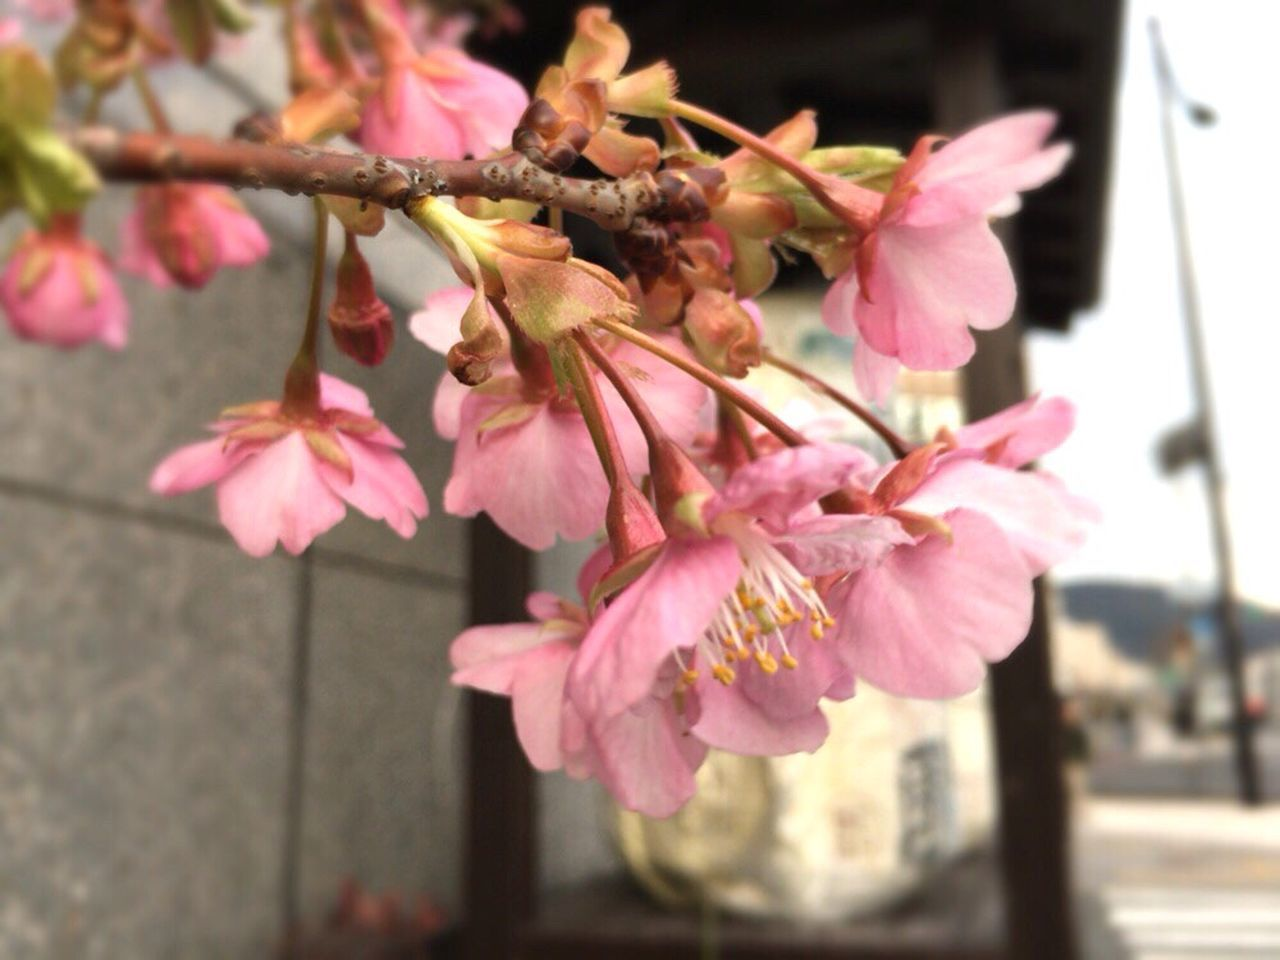 Kyoto,japan Kyoto Spling Sakura Cherry Blossom Kyoto City Kyoto Cherry Blossom Kyoto Sakura 2017 Kyoto Sakura Kyoto Spling Flower Cherry Blossoms Sakura 2017 February Cherry Blossoms February Sakura